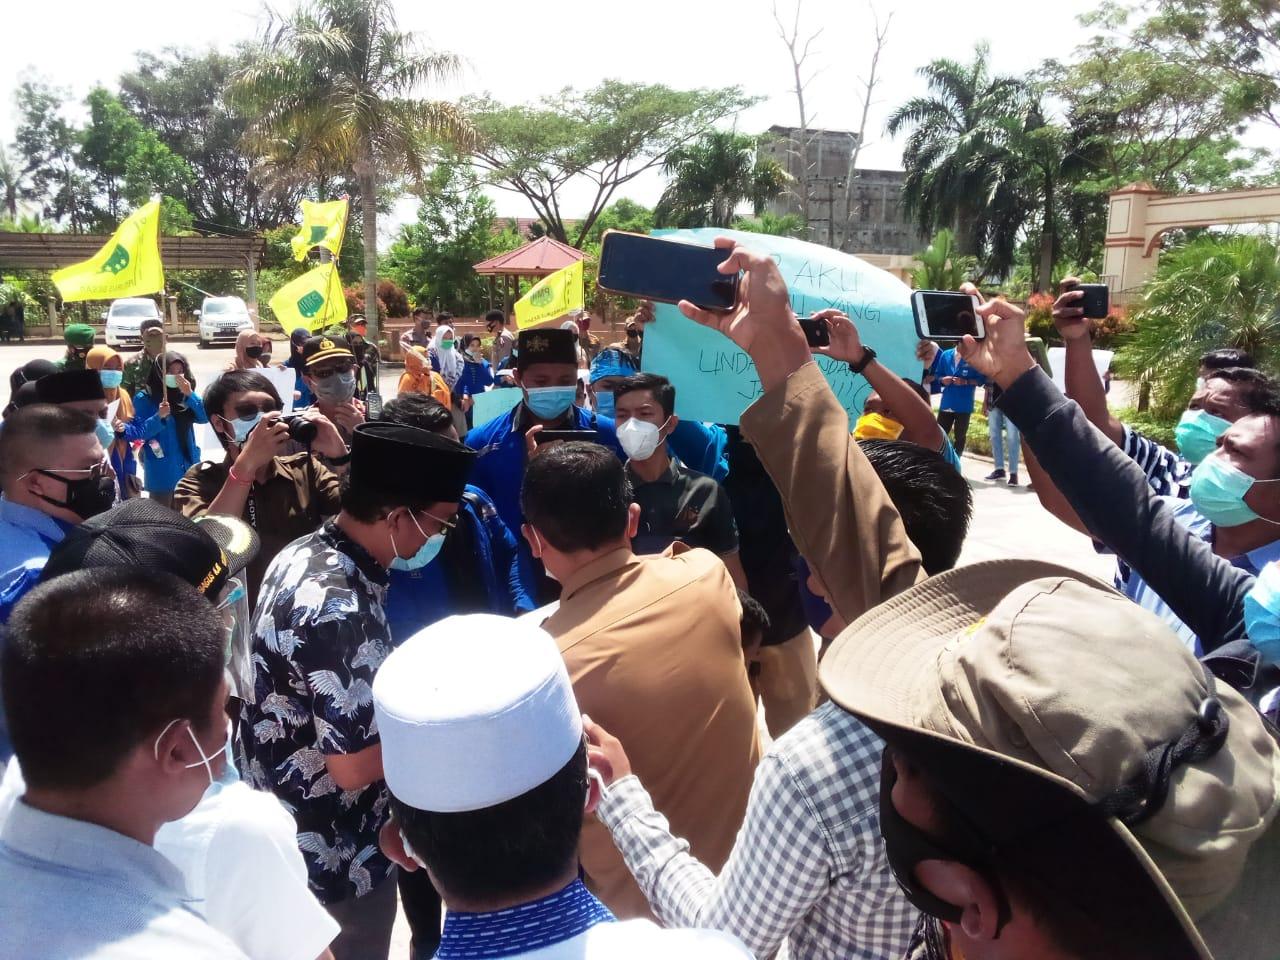 DPRD Tanjab Barat Setuju Tolak Omnibus Law UU Cipta Kerja